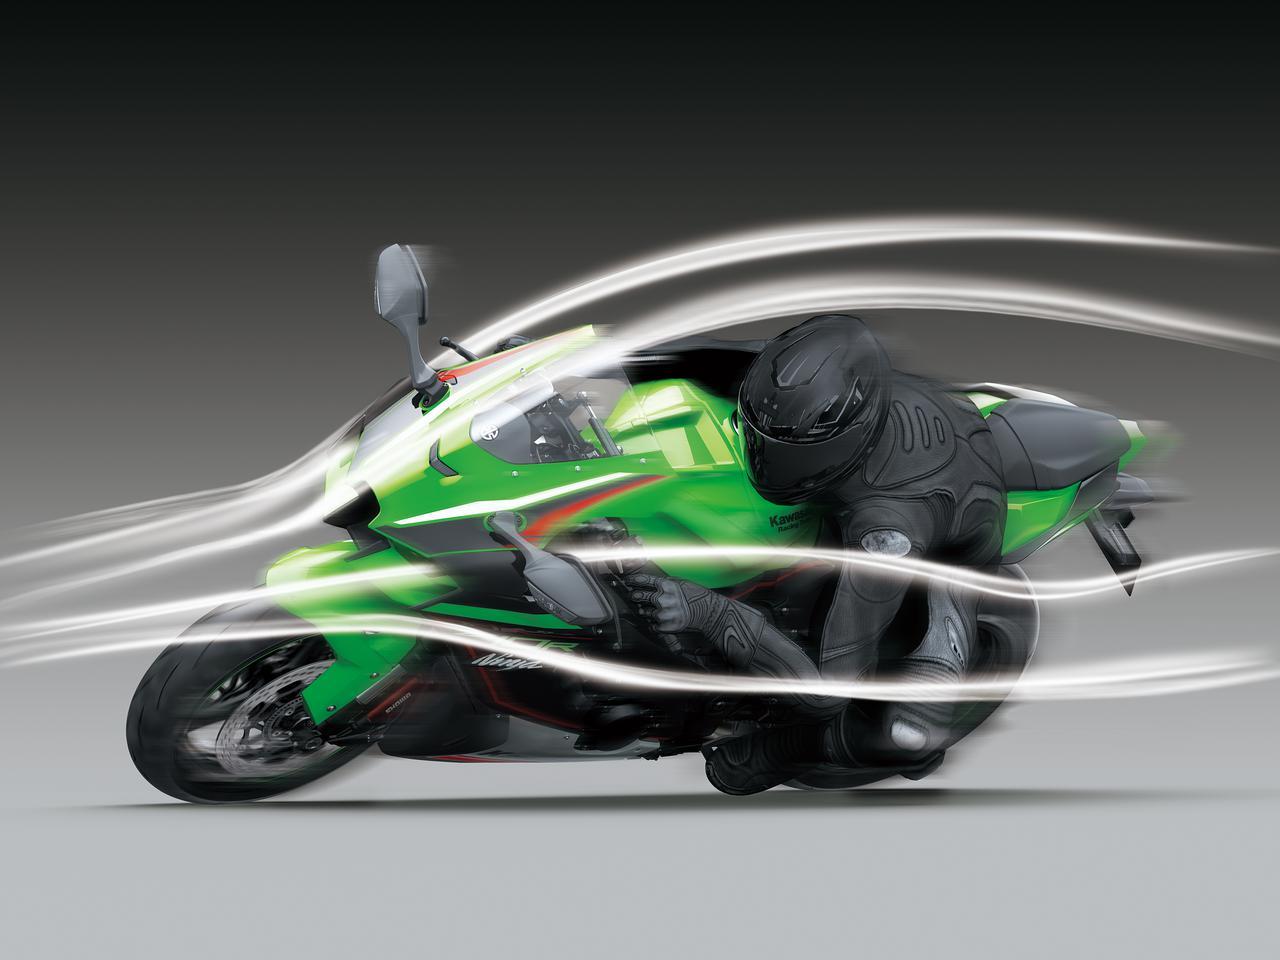 Images : 12番目の画像 - 【写真36枚】カワサキ 新型 Ninja ZX-10R/Ninja ZX-10RR - webオートバイ